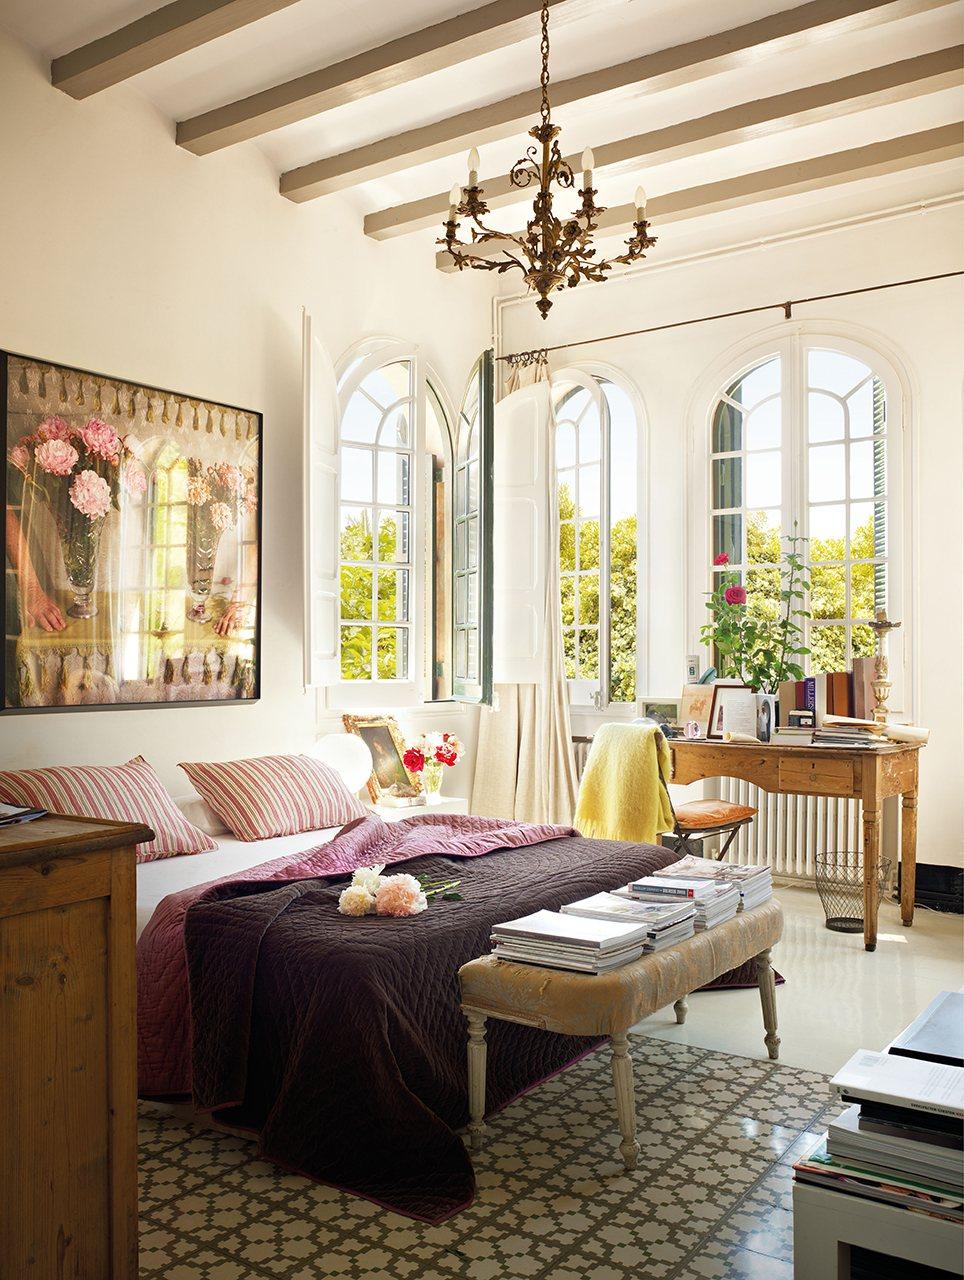 21 Charming & Comfortable Bedroom Interior Design on Comfy Bedroom Ideas  id=44774